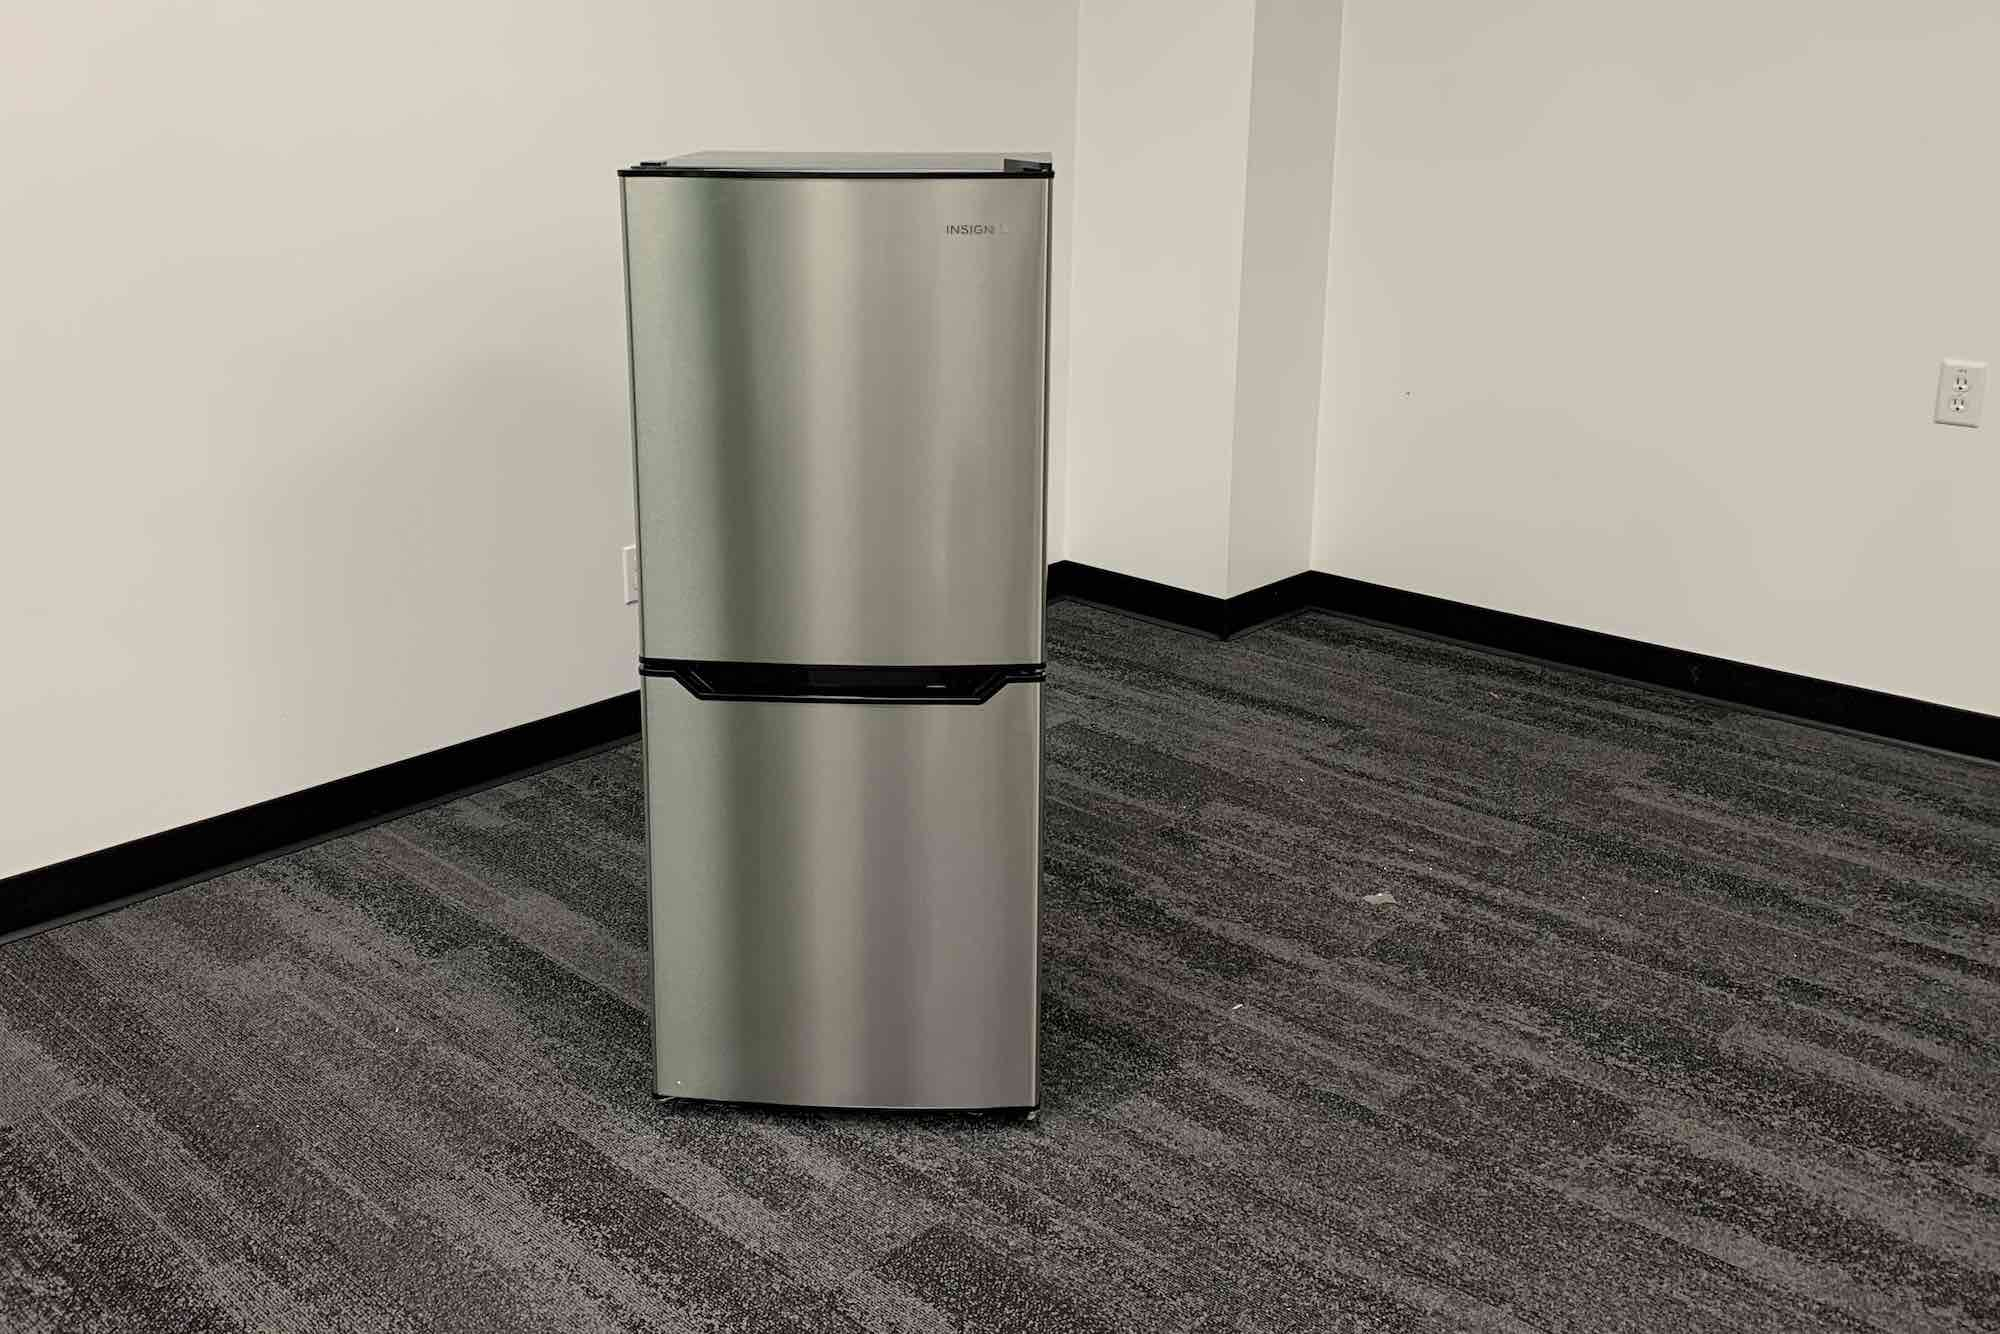 Insignia bottom mount mini fridge